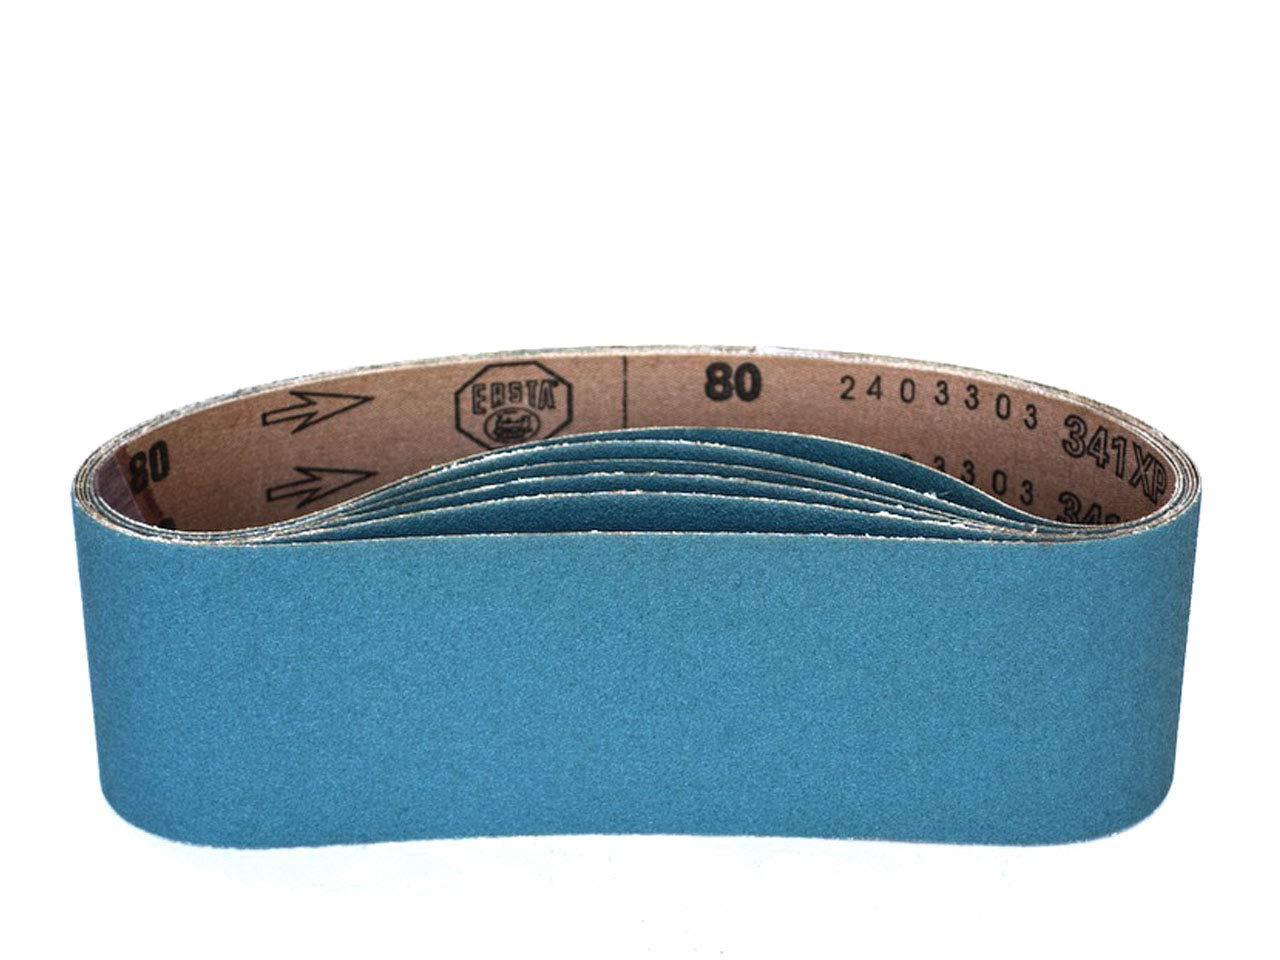 3 X 21 Inch Sanding Belts Zirconia Cloth Narrow Sander Belts 8 Pack, 24 Grit